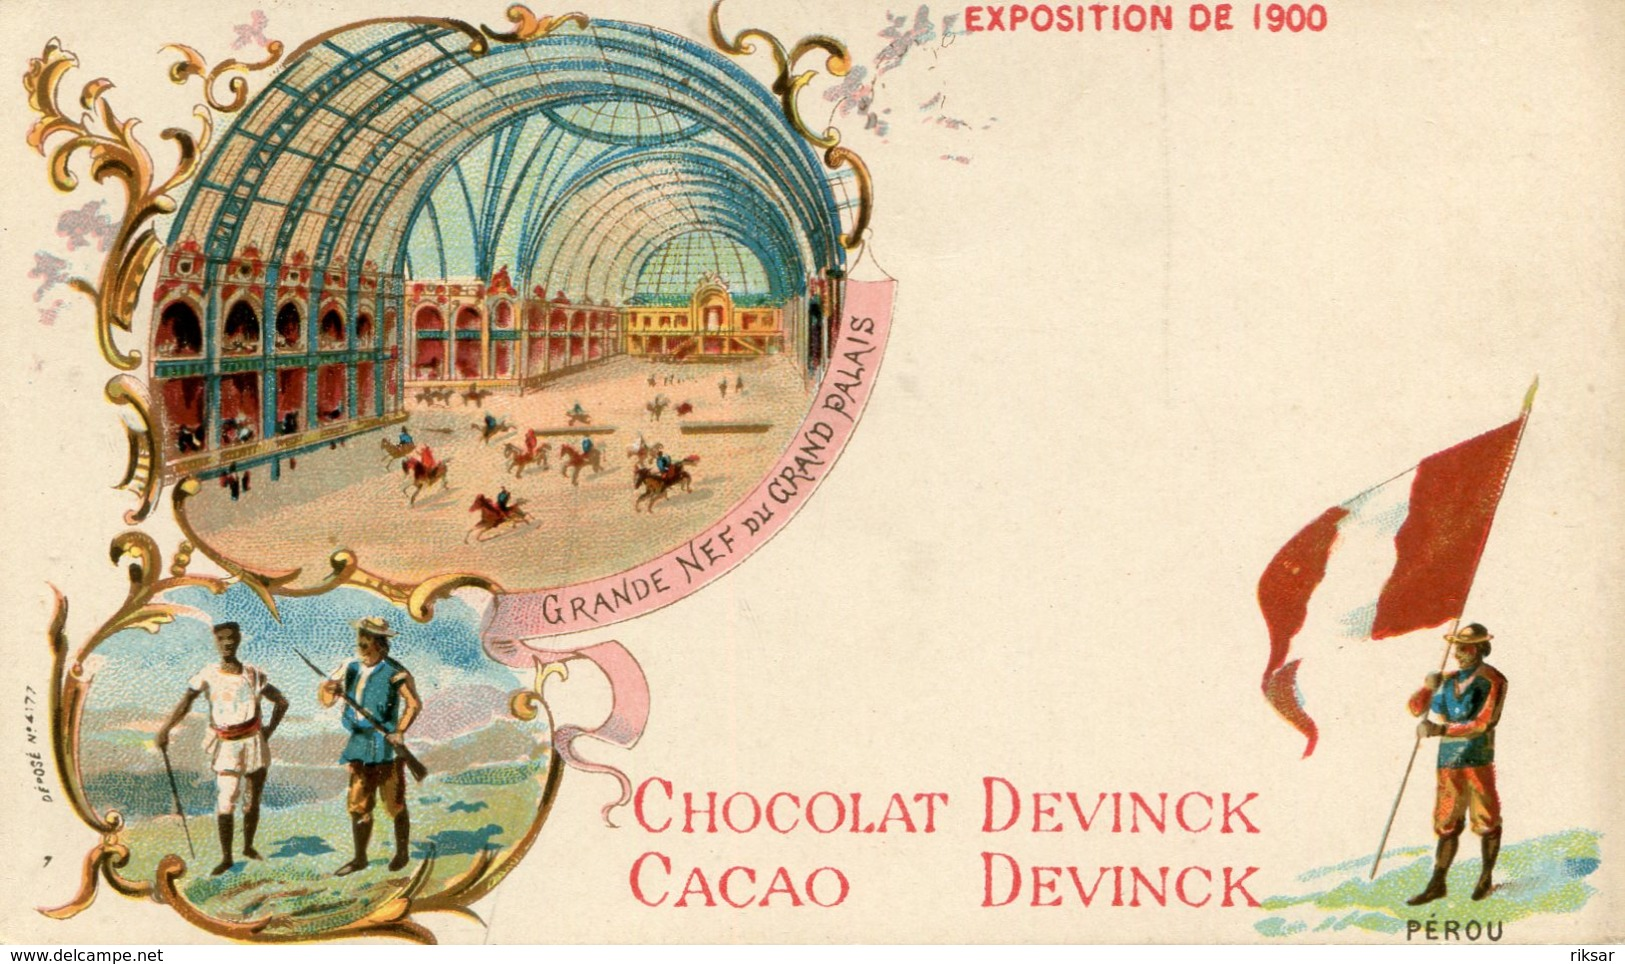 PEROU(EXPOSITION 1900 PARIS) - Peru